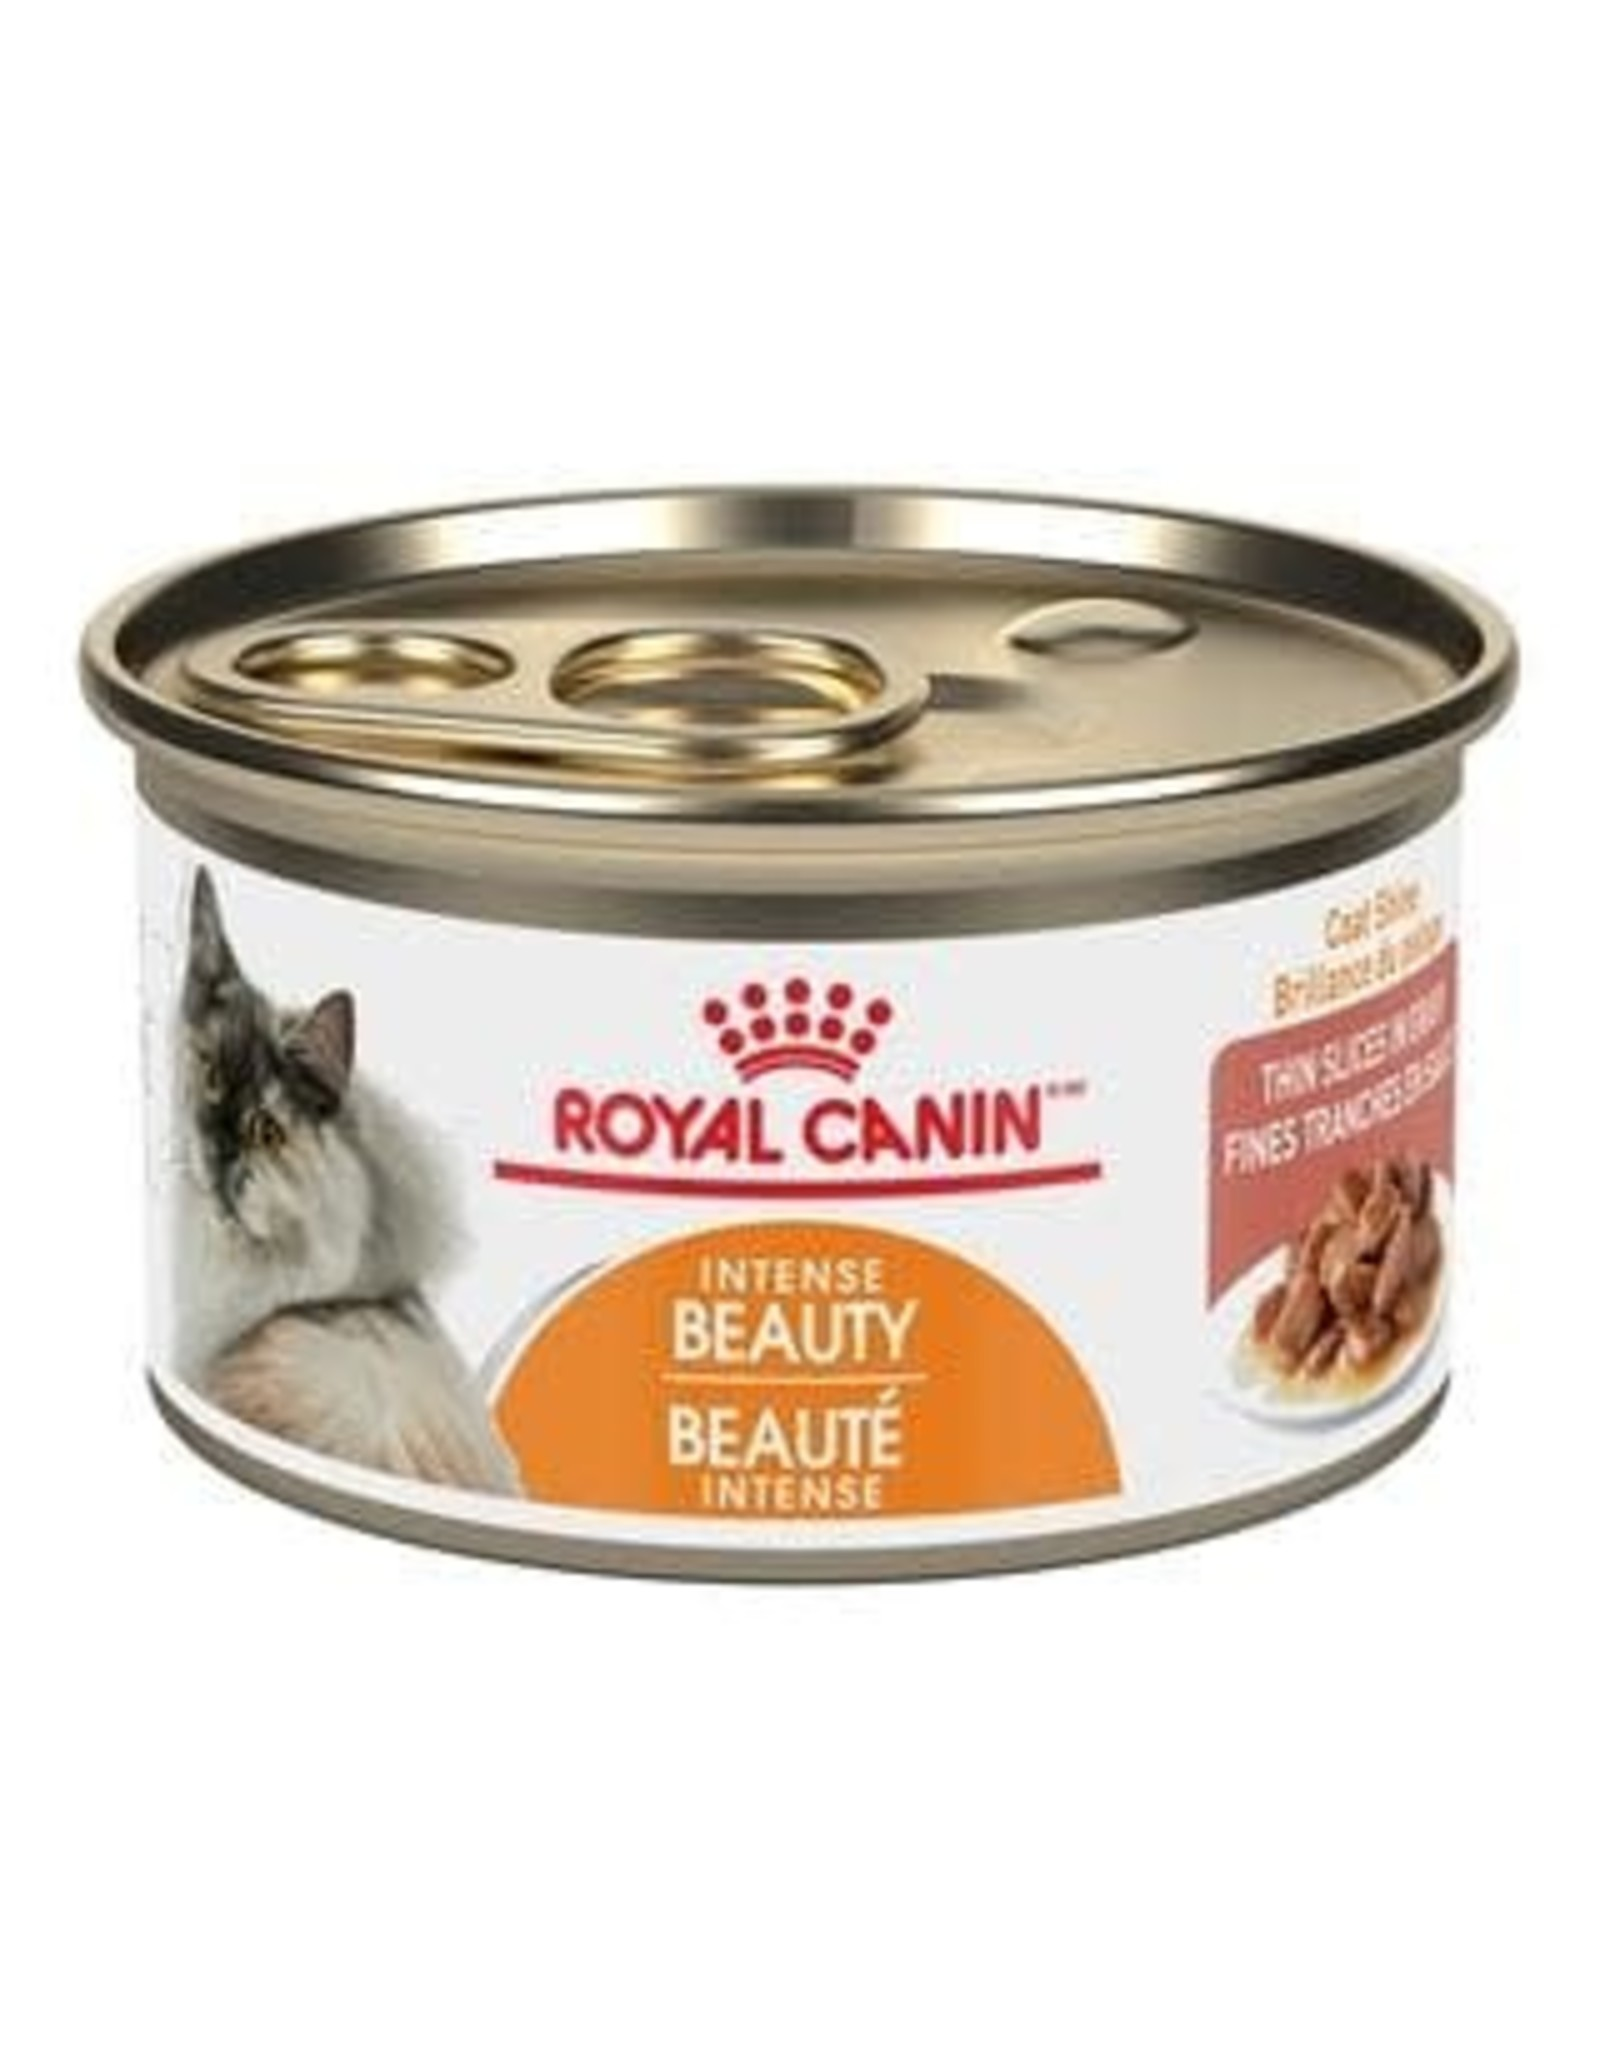 Royal Canin Royal Canin Cat - Beauty thin slices in gravy 3oz